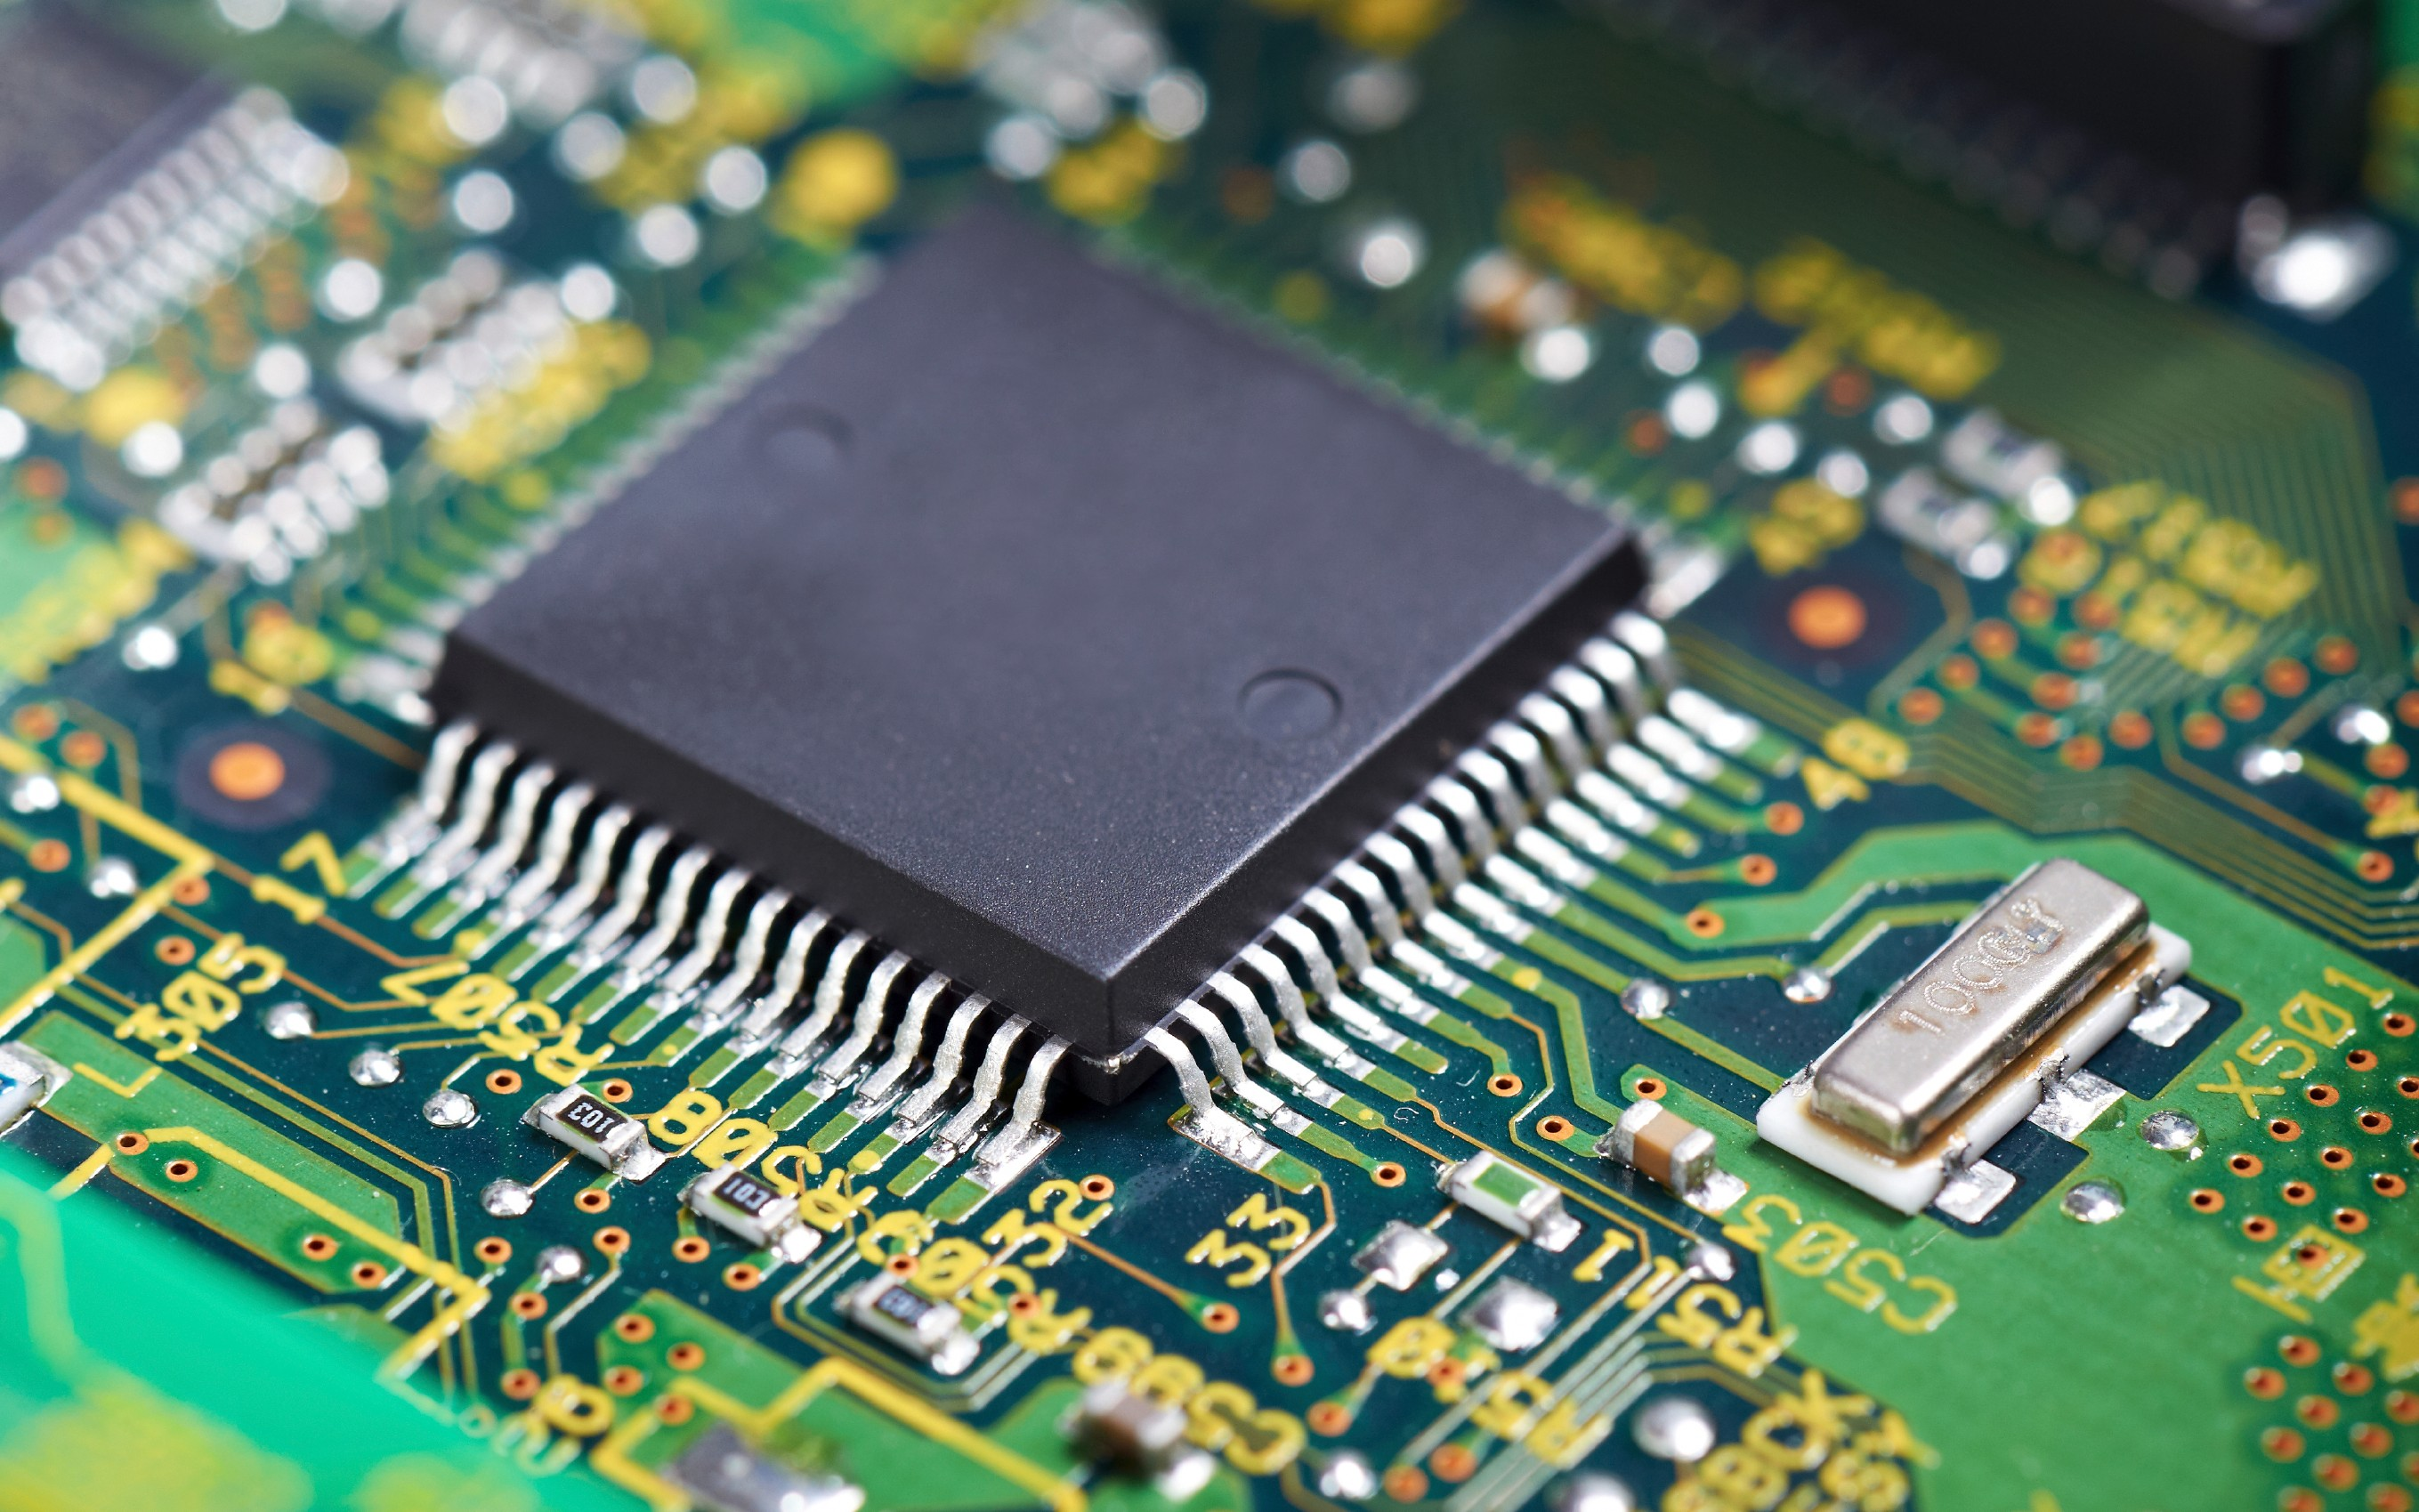 embedded hardware engineer sample resume - Embedded Hardware Engineer Sample Resume